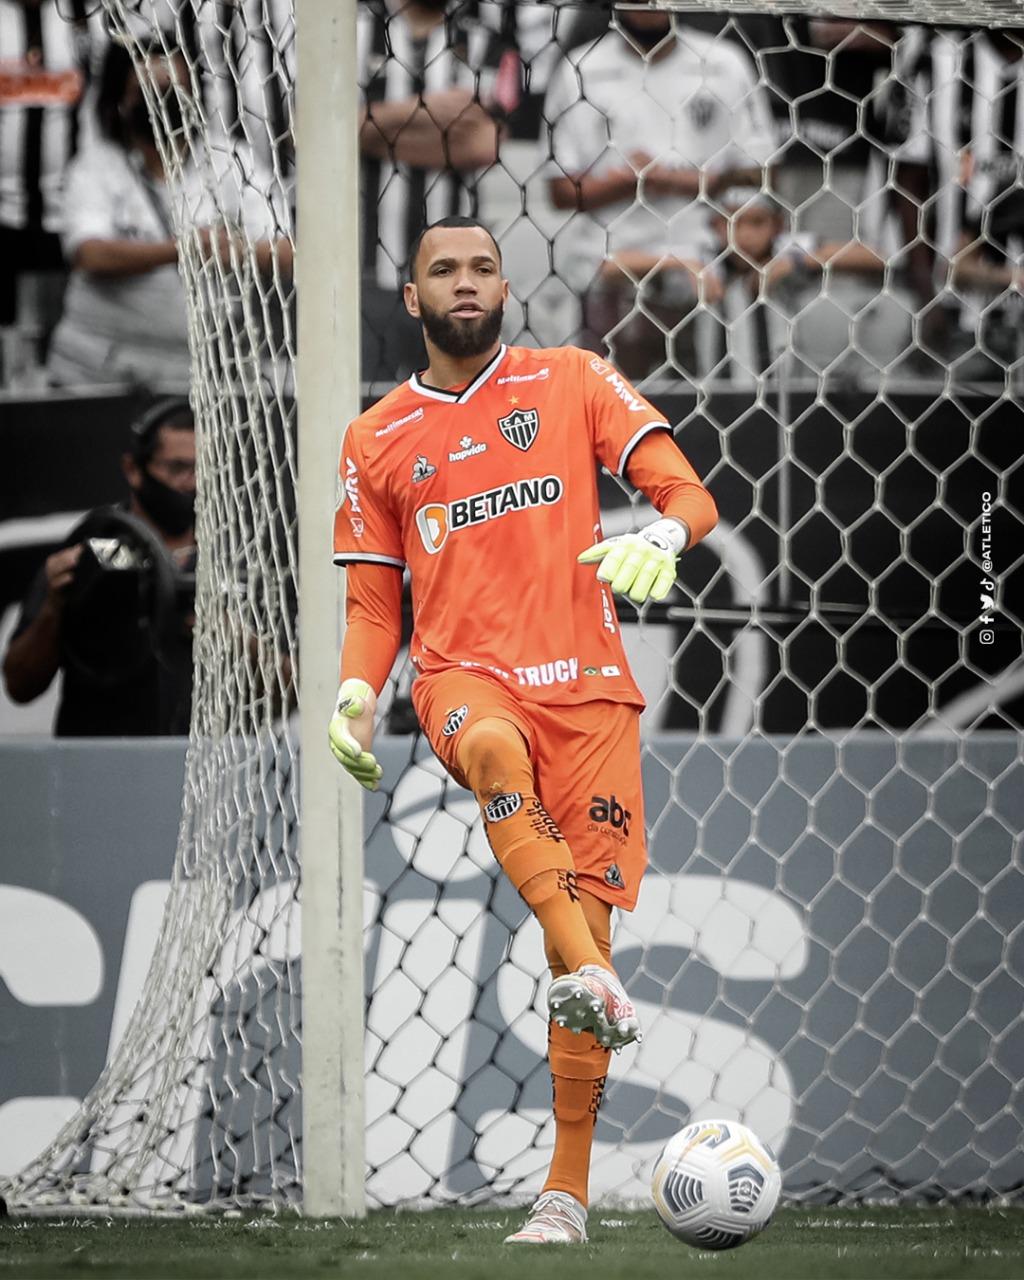 Atlético Twitter